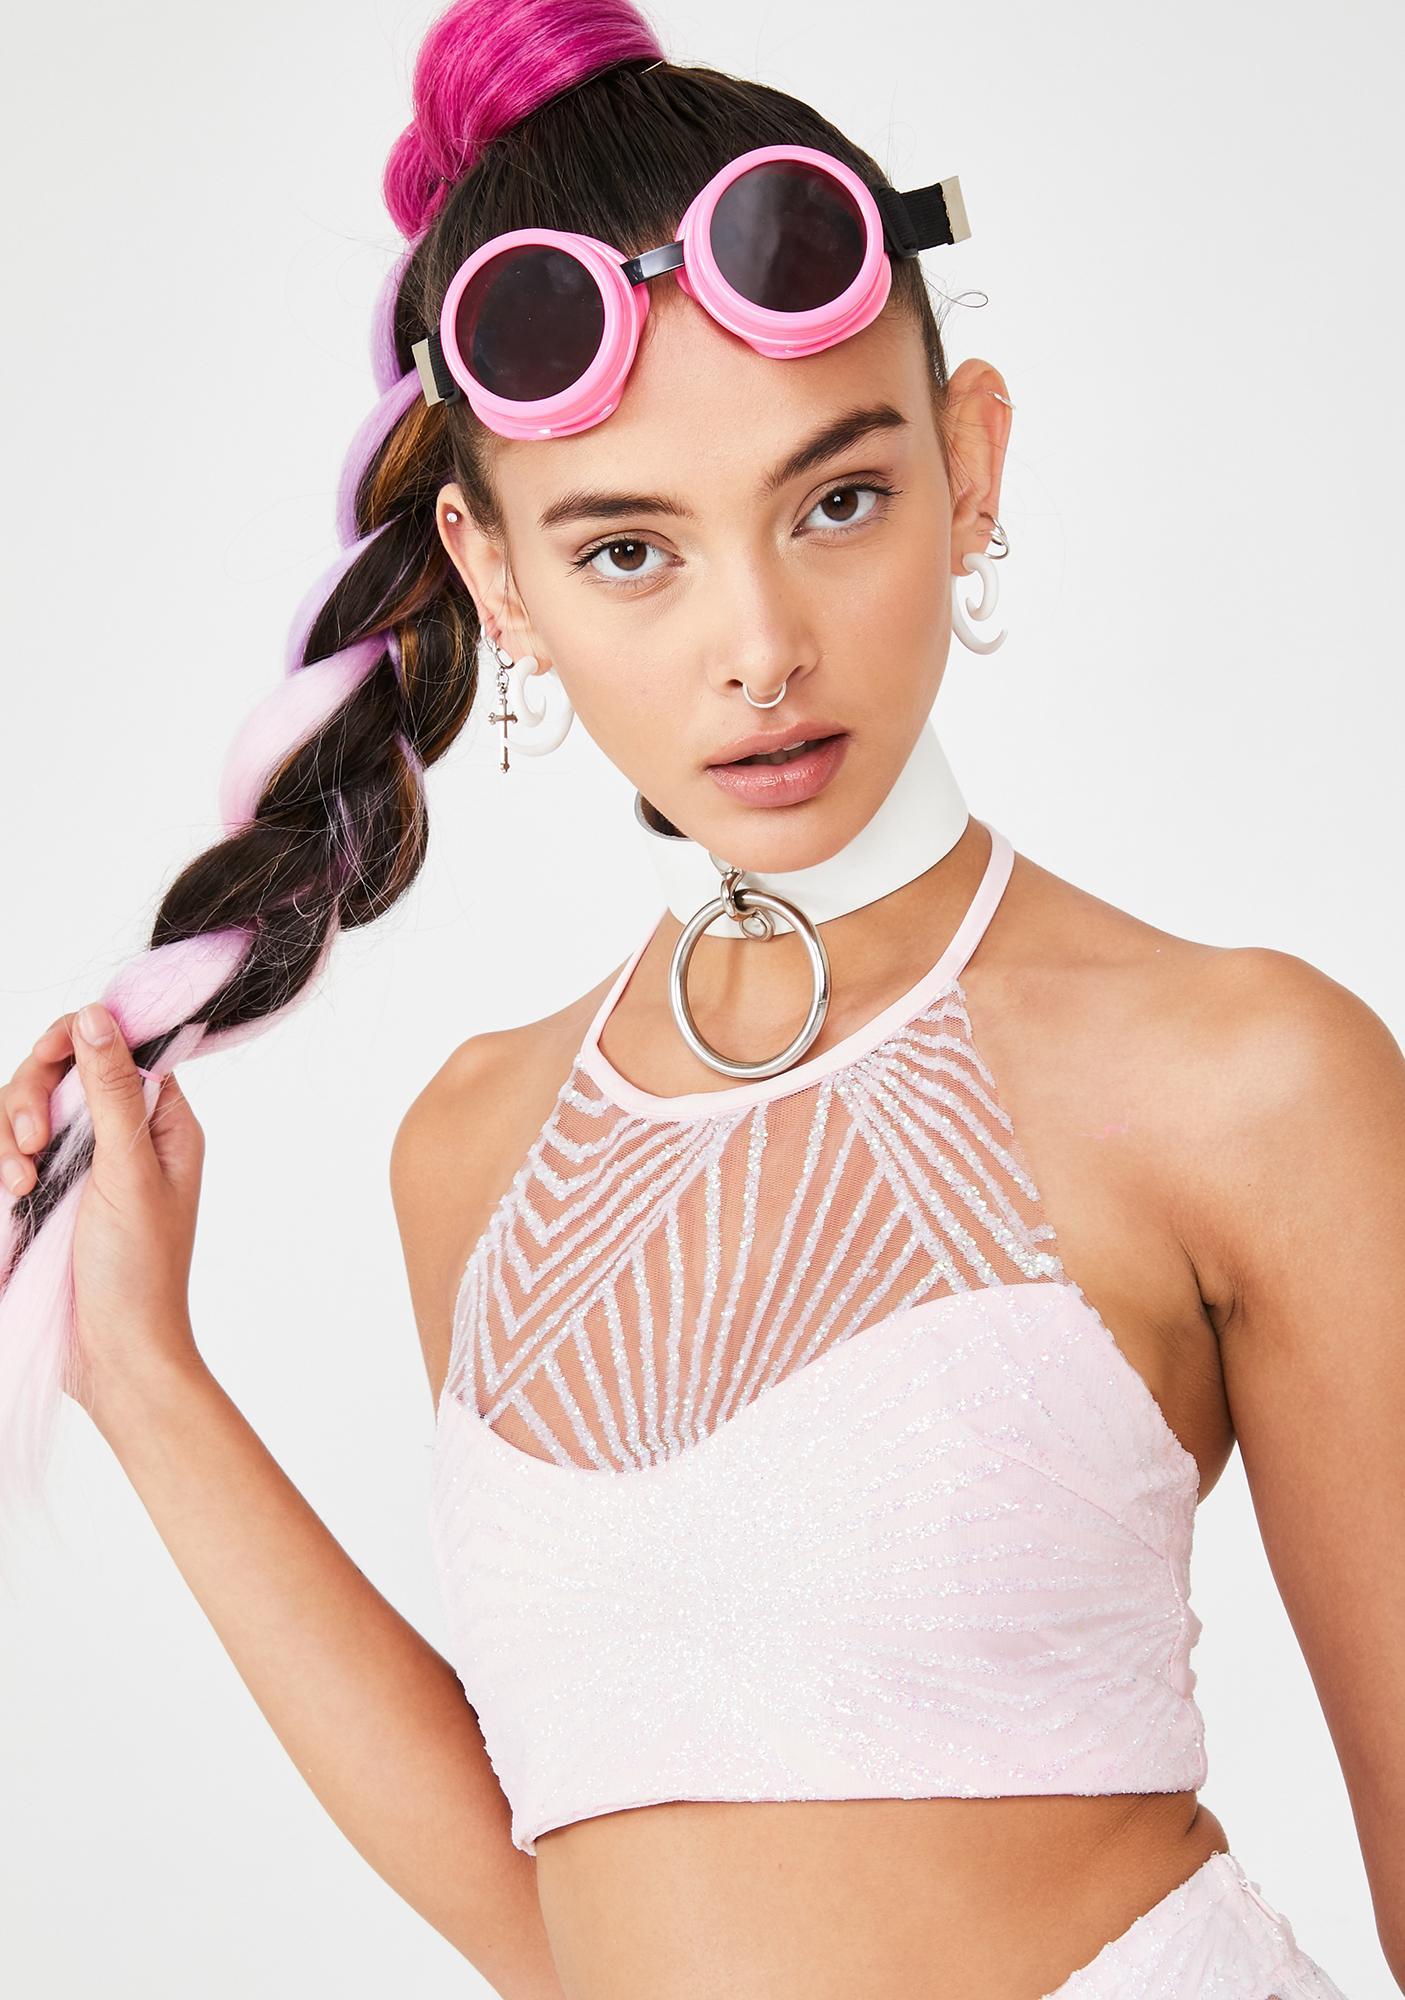 Glamorous Playful Pixie Crop Top